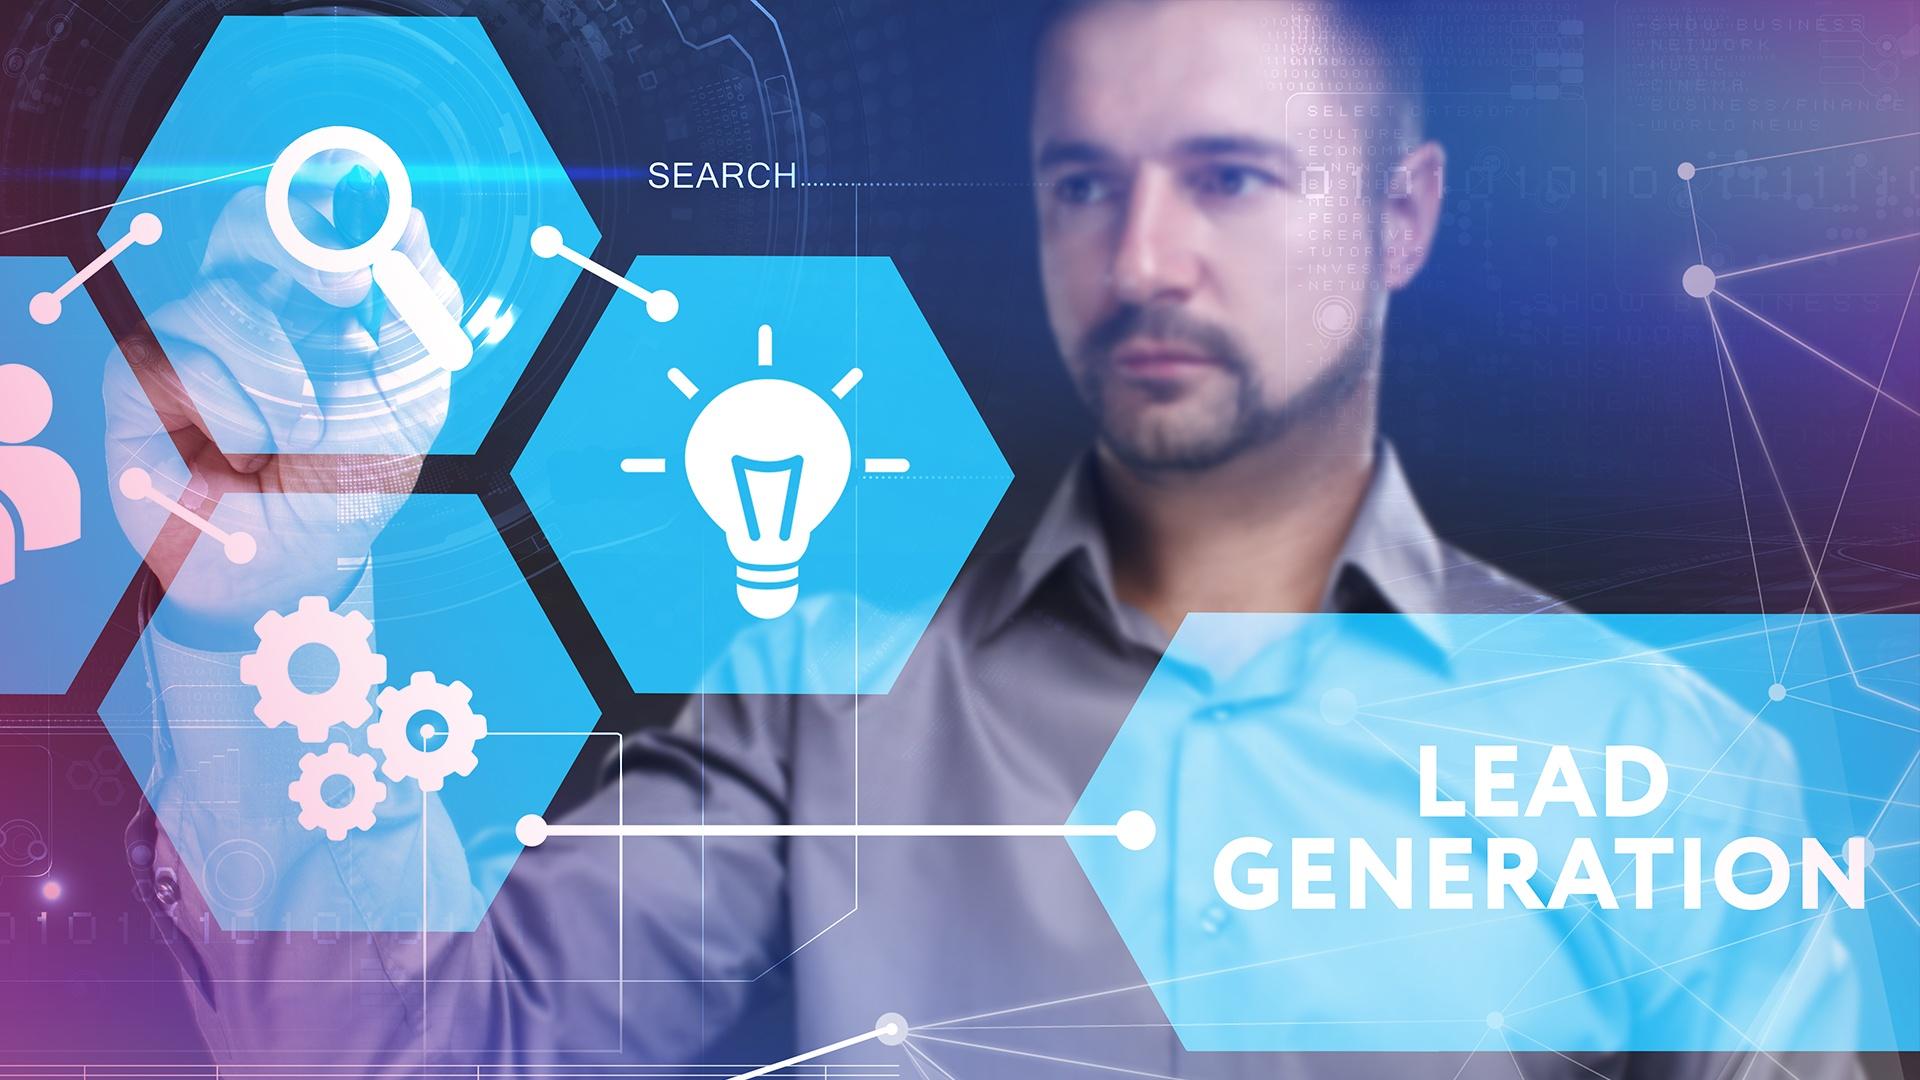 LeadGeneration_2.jpg